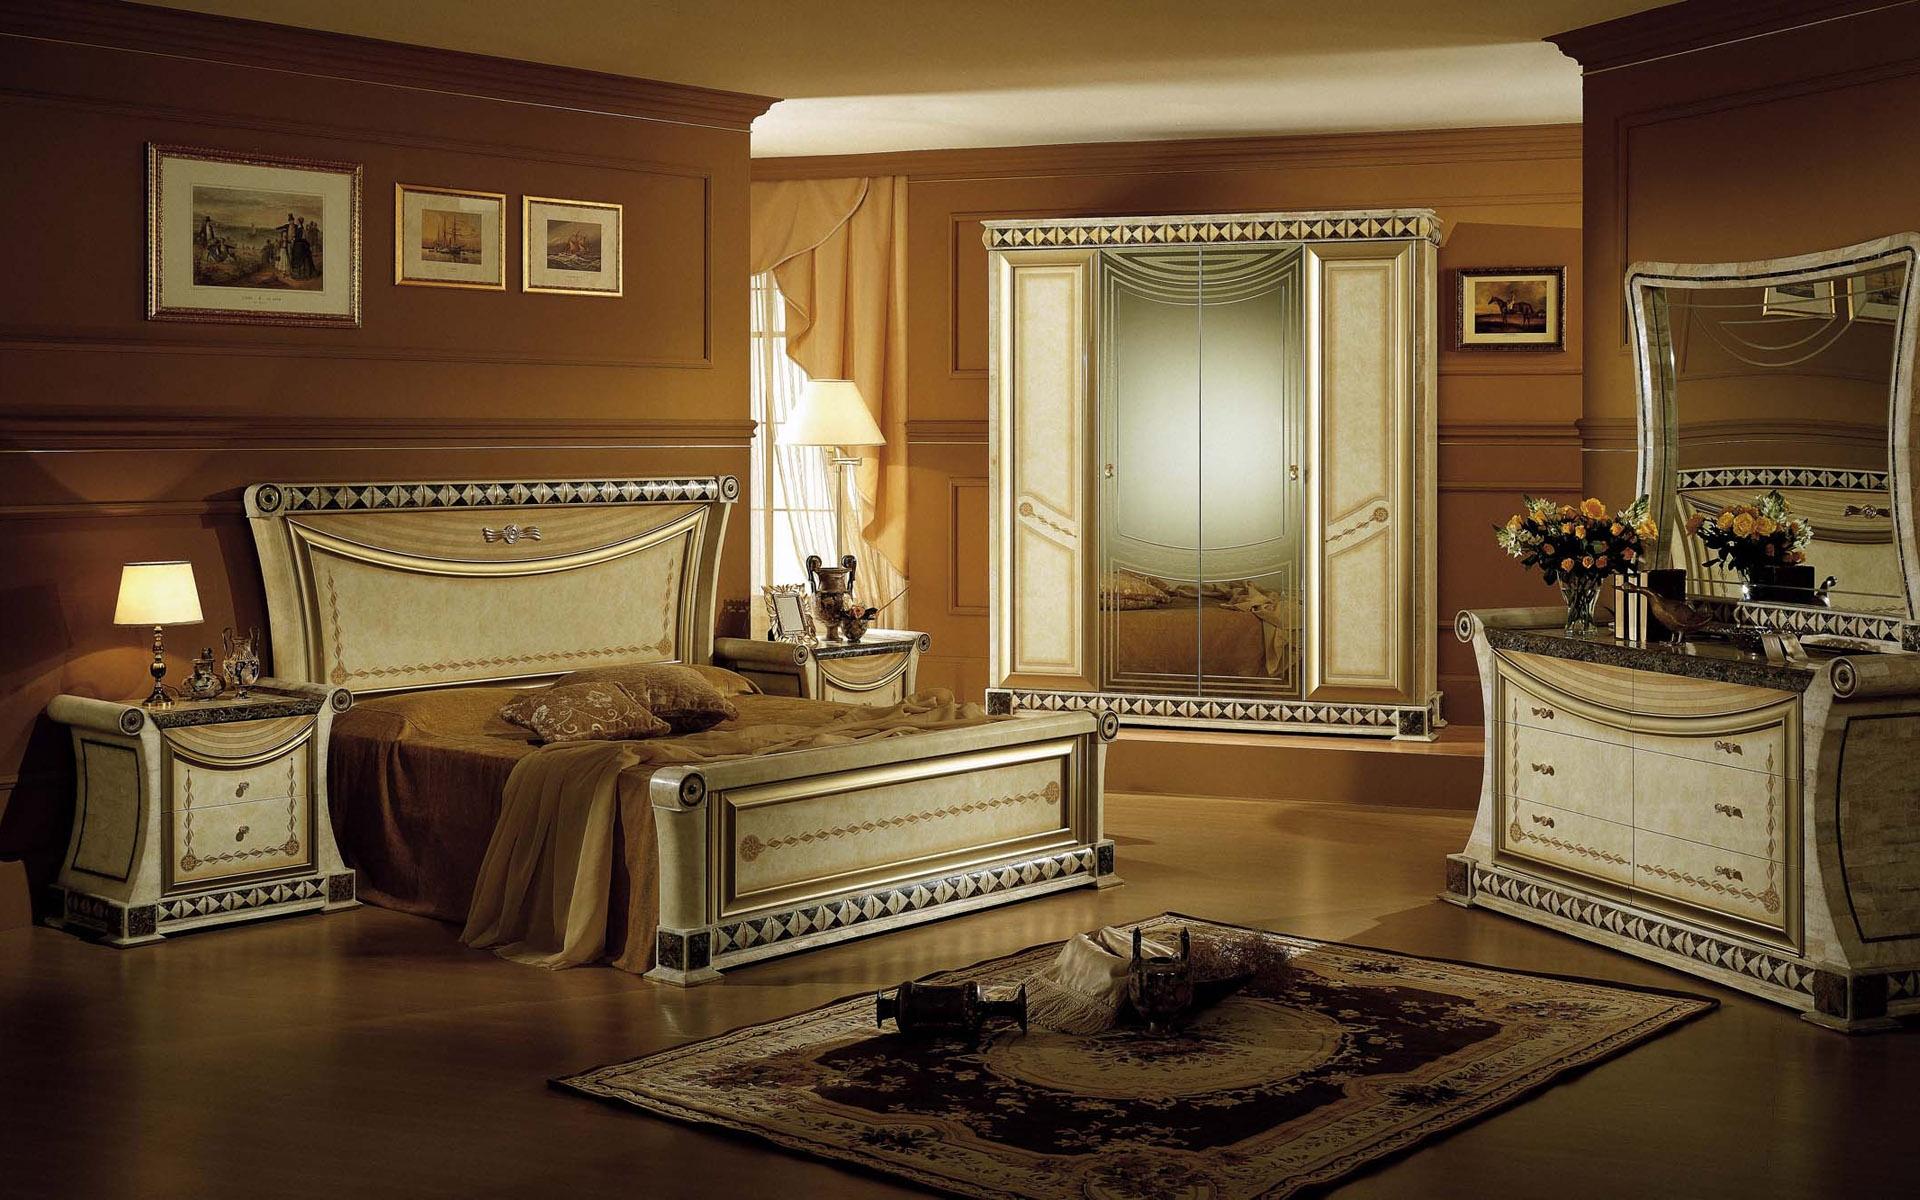 Comptoir de la literie amazing airconfort with comptoir for Room decoration ideas on dailymotion